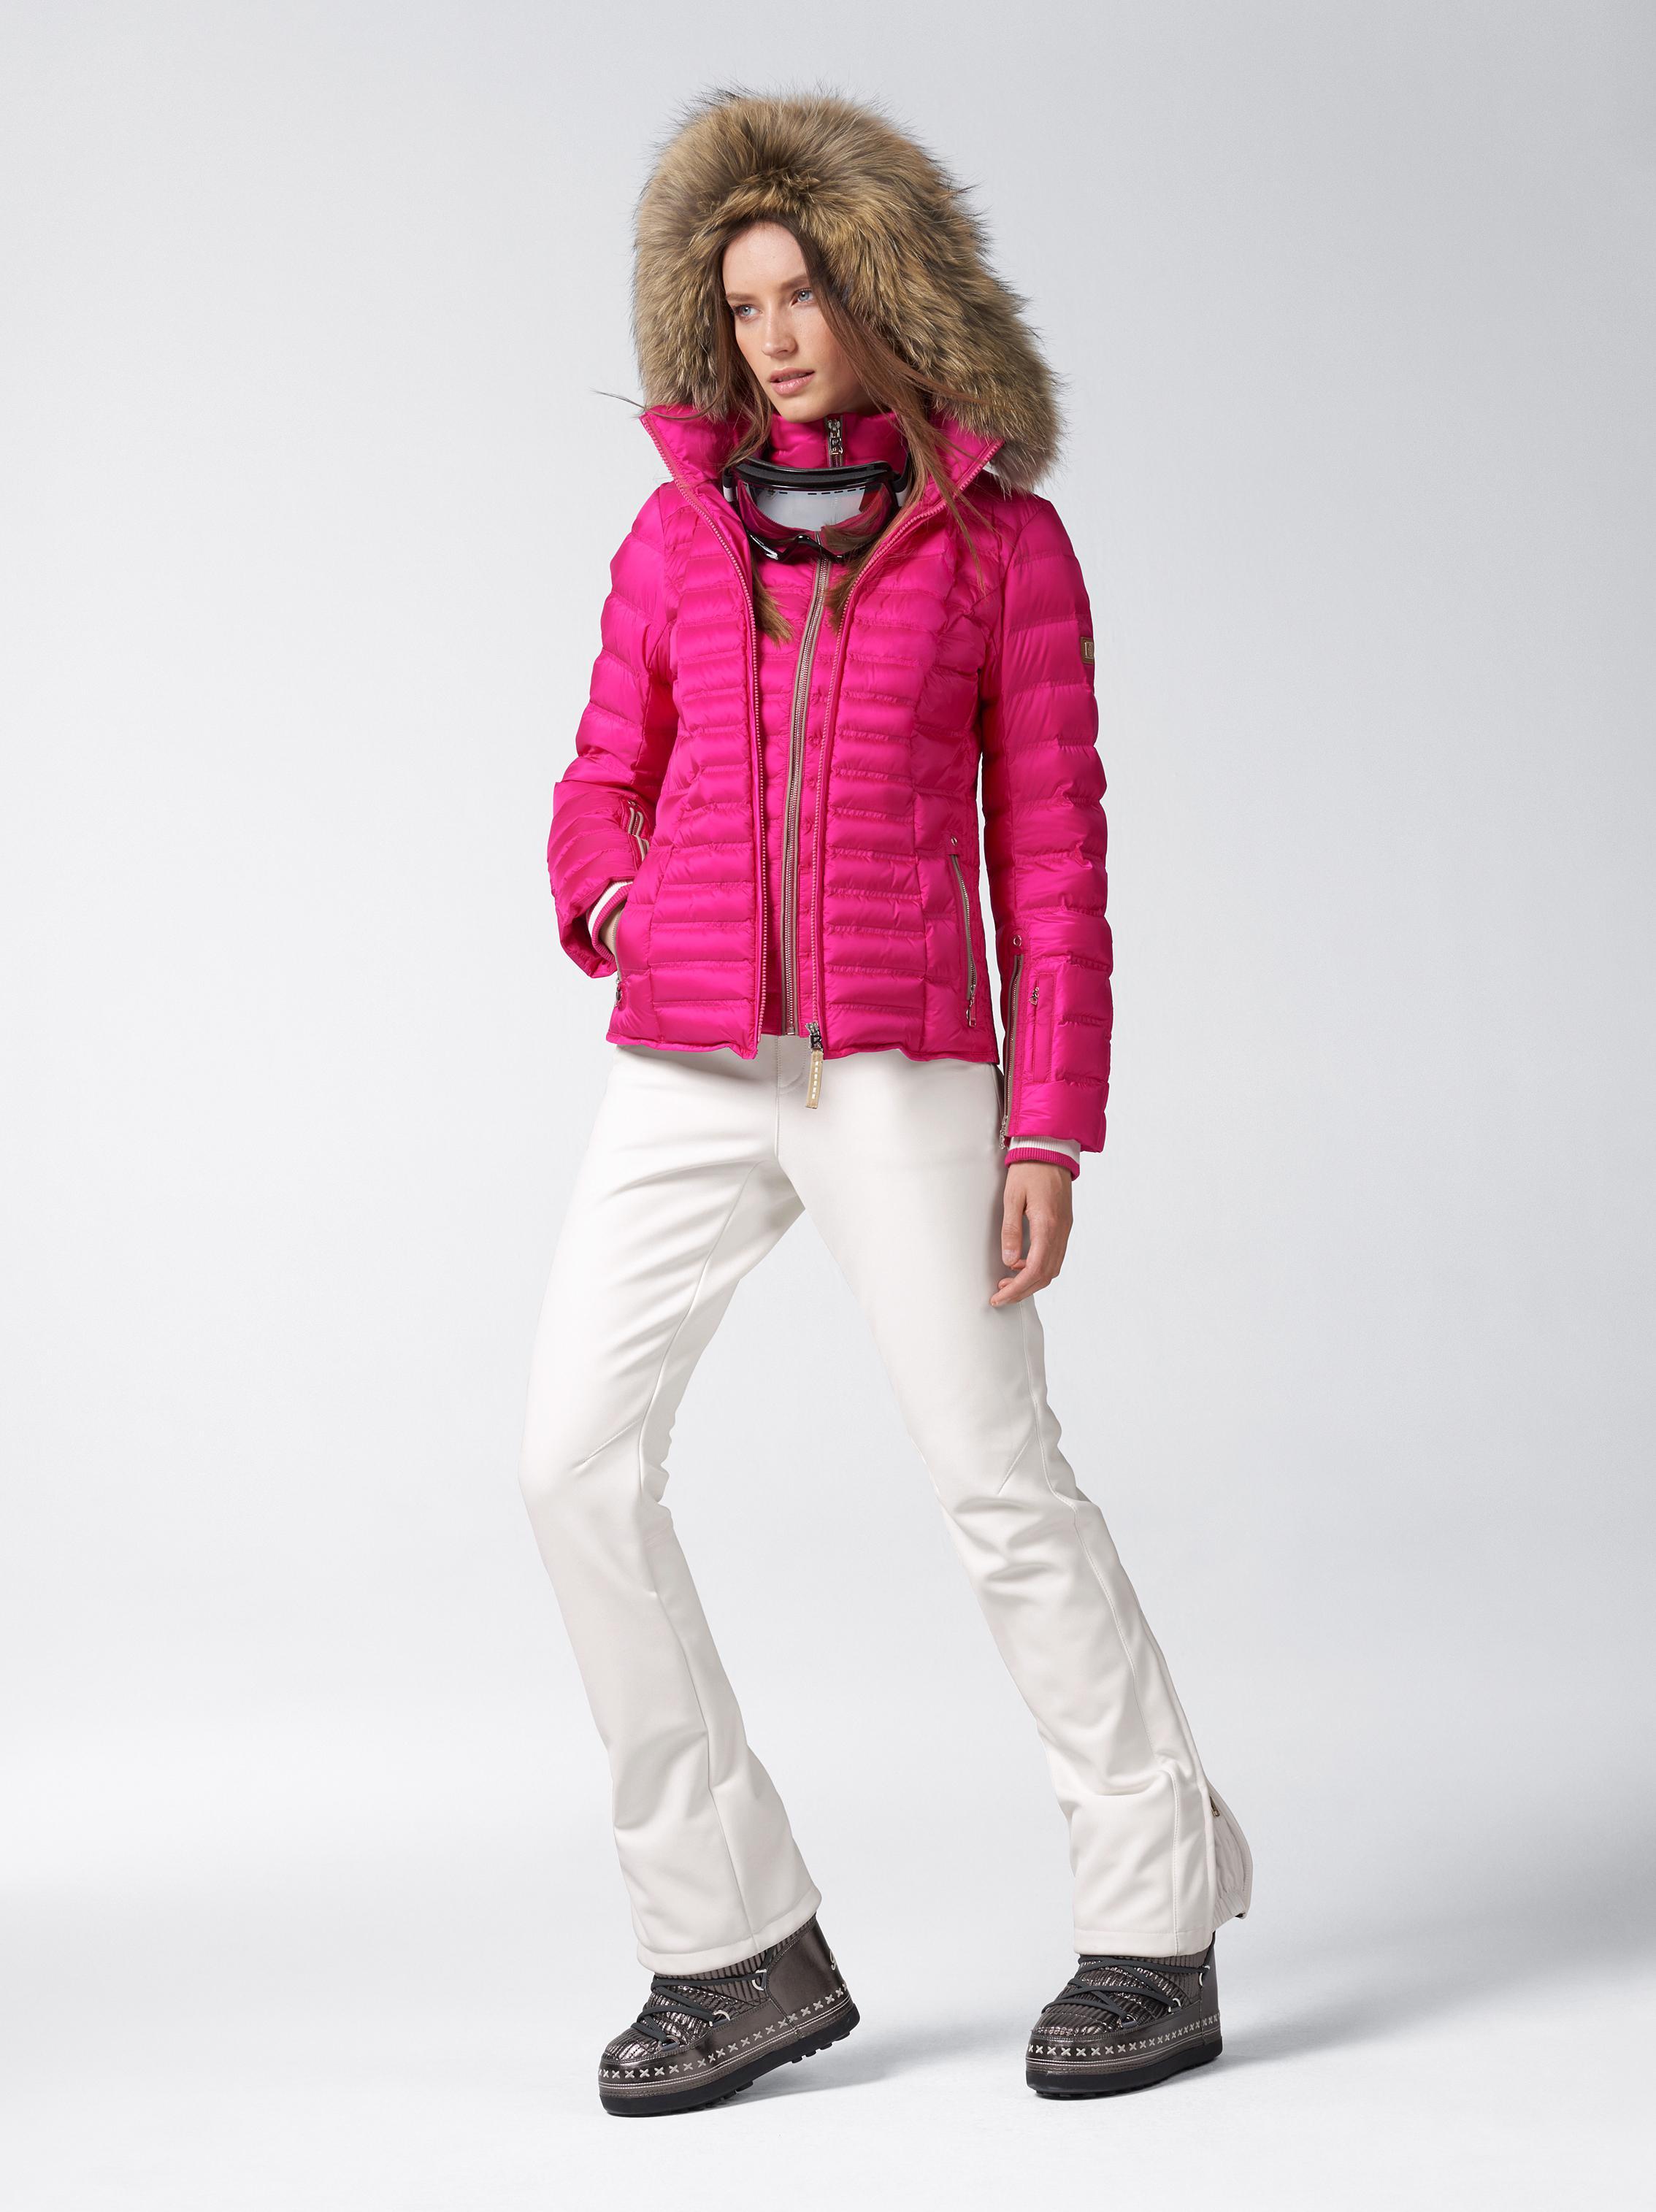 76fbfe7b1ab4dc Bogner Ski Down Jacket Nasha in Pink - Lyst